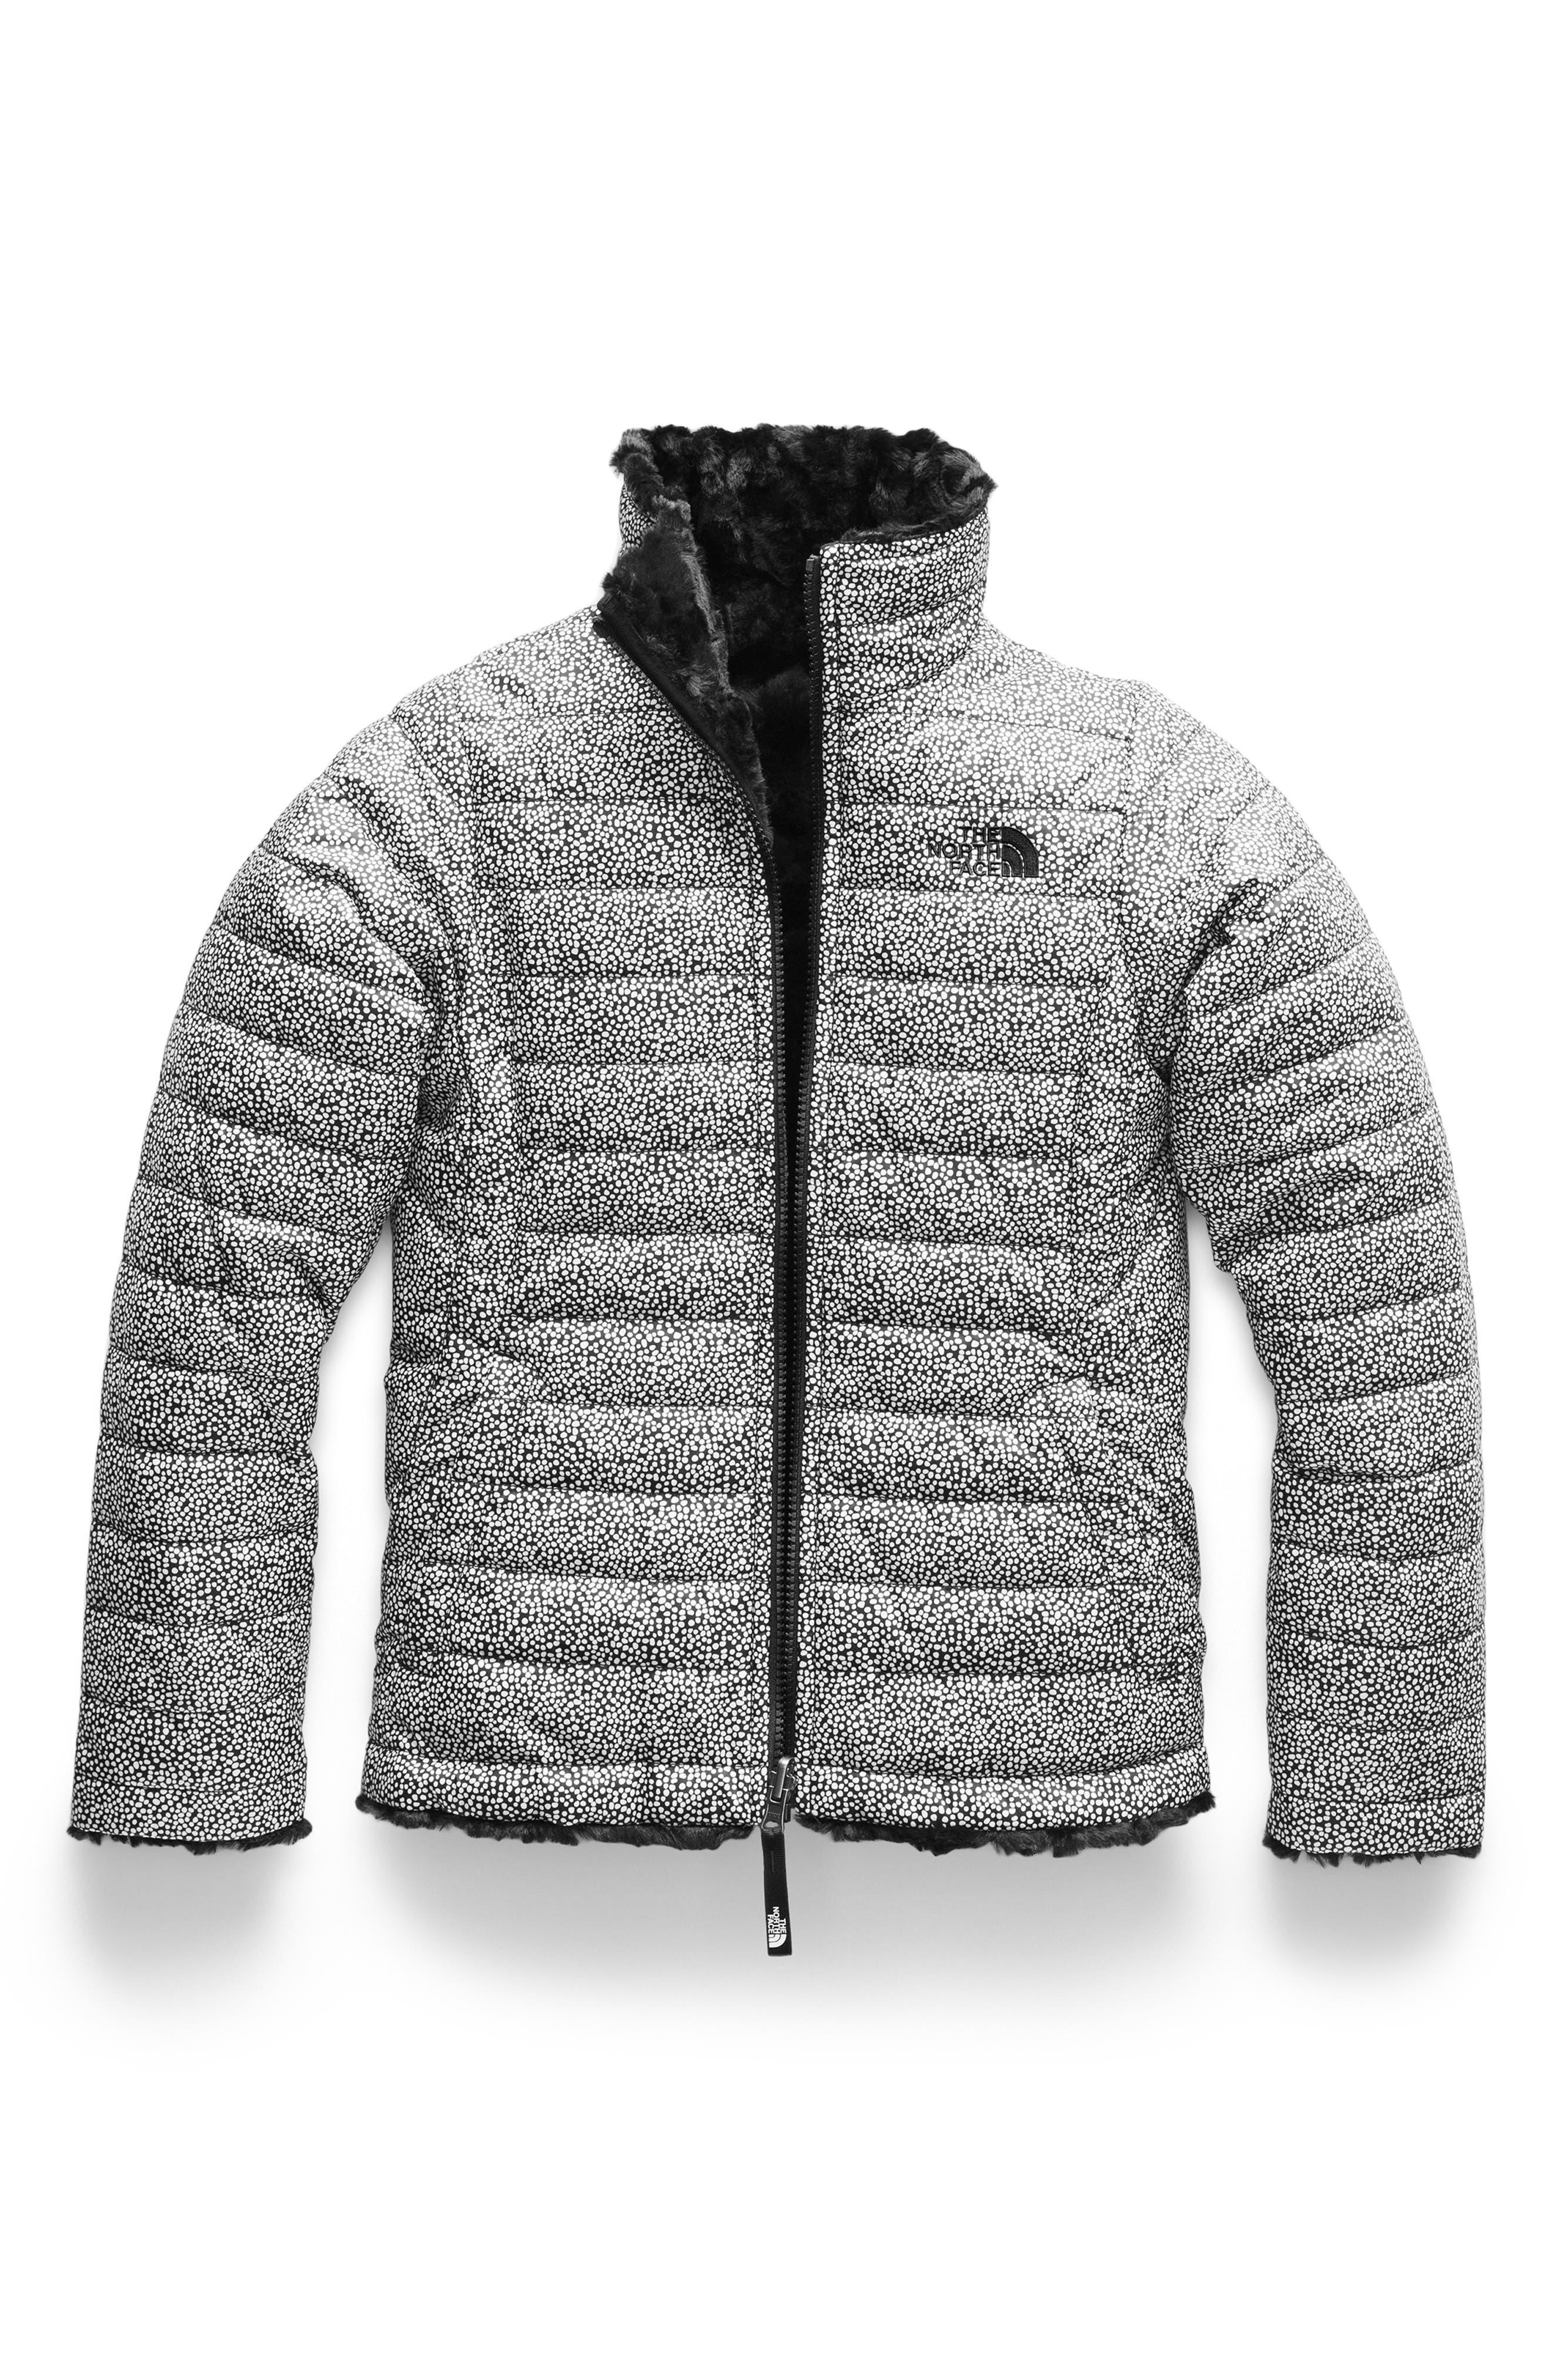 Black Coats for Teenagers